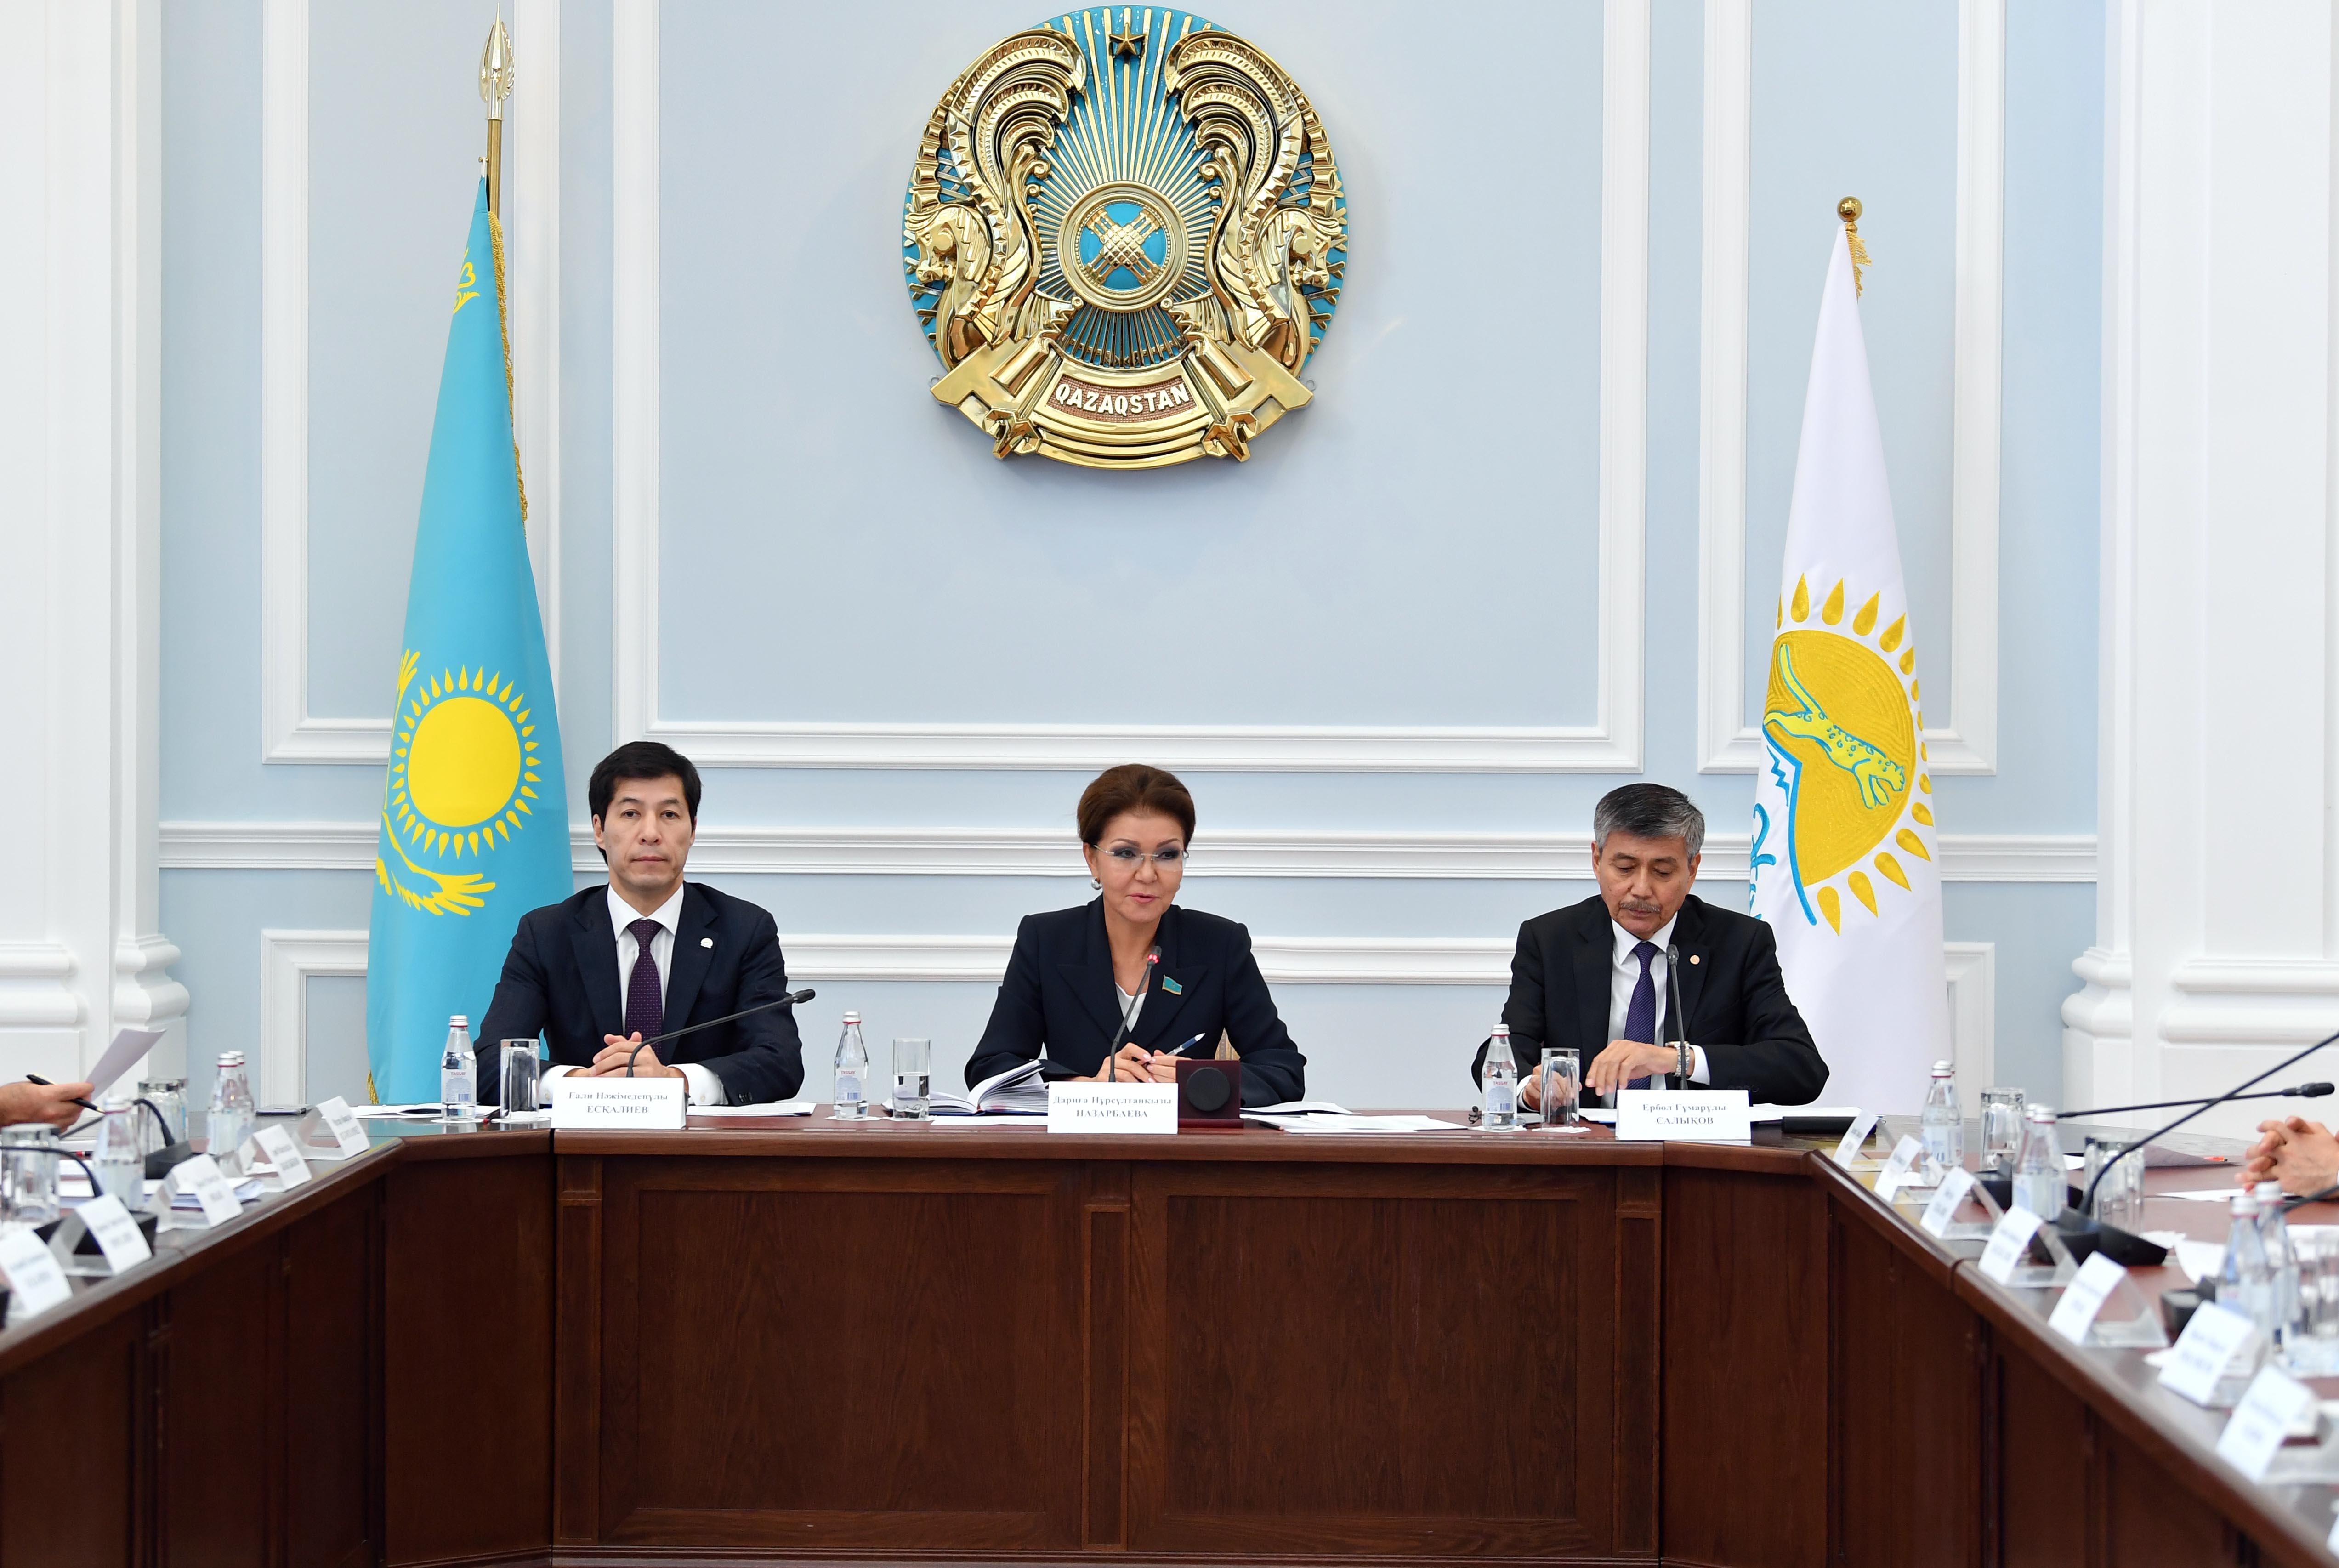 889715d886668d433d546162b26d32b7 - Dariga Nazarbayeva met in Western Kazakhstan